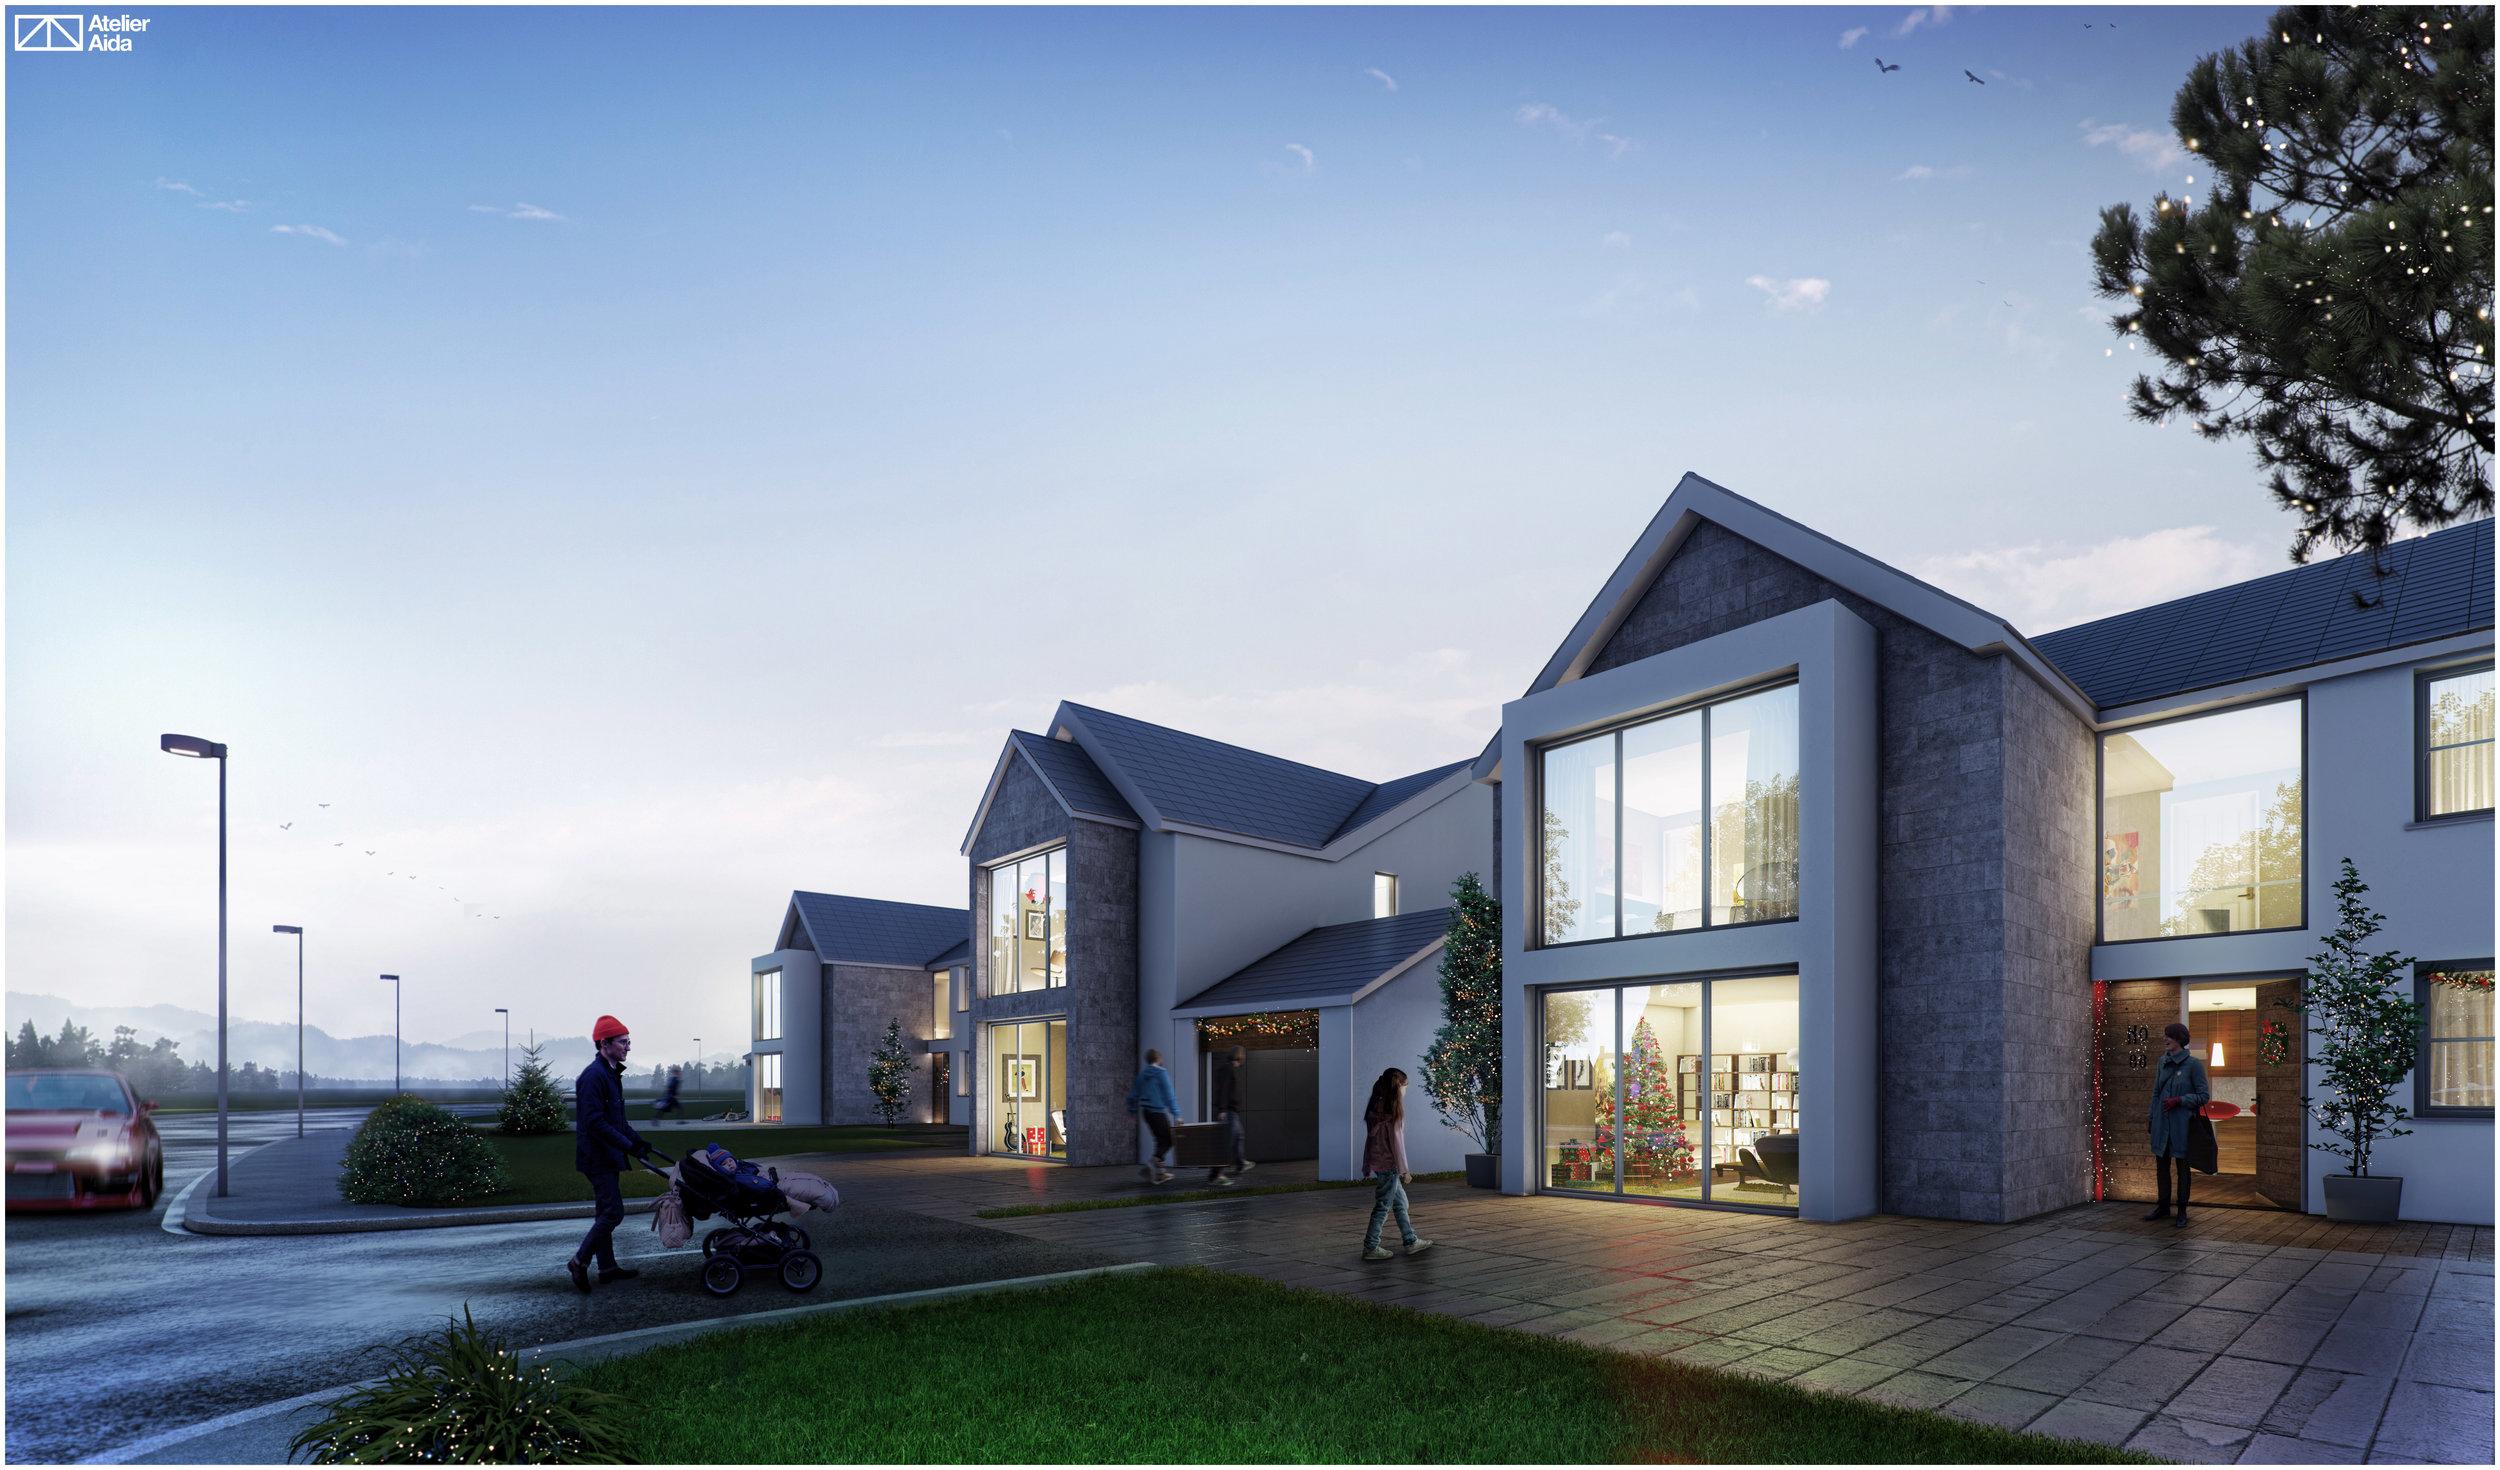 3 New Houses, Old Way, Bishopstone, Swansea